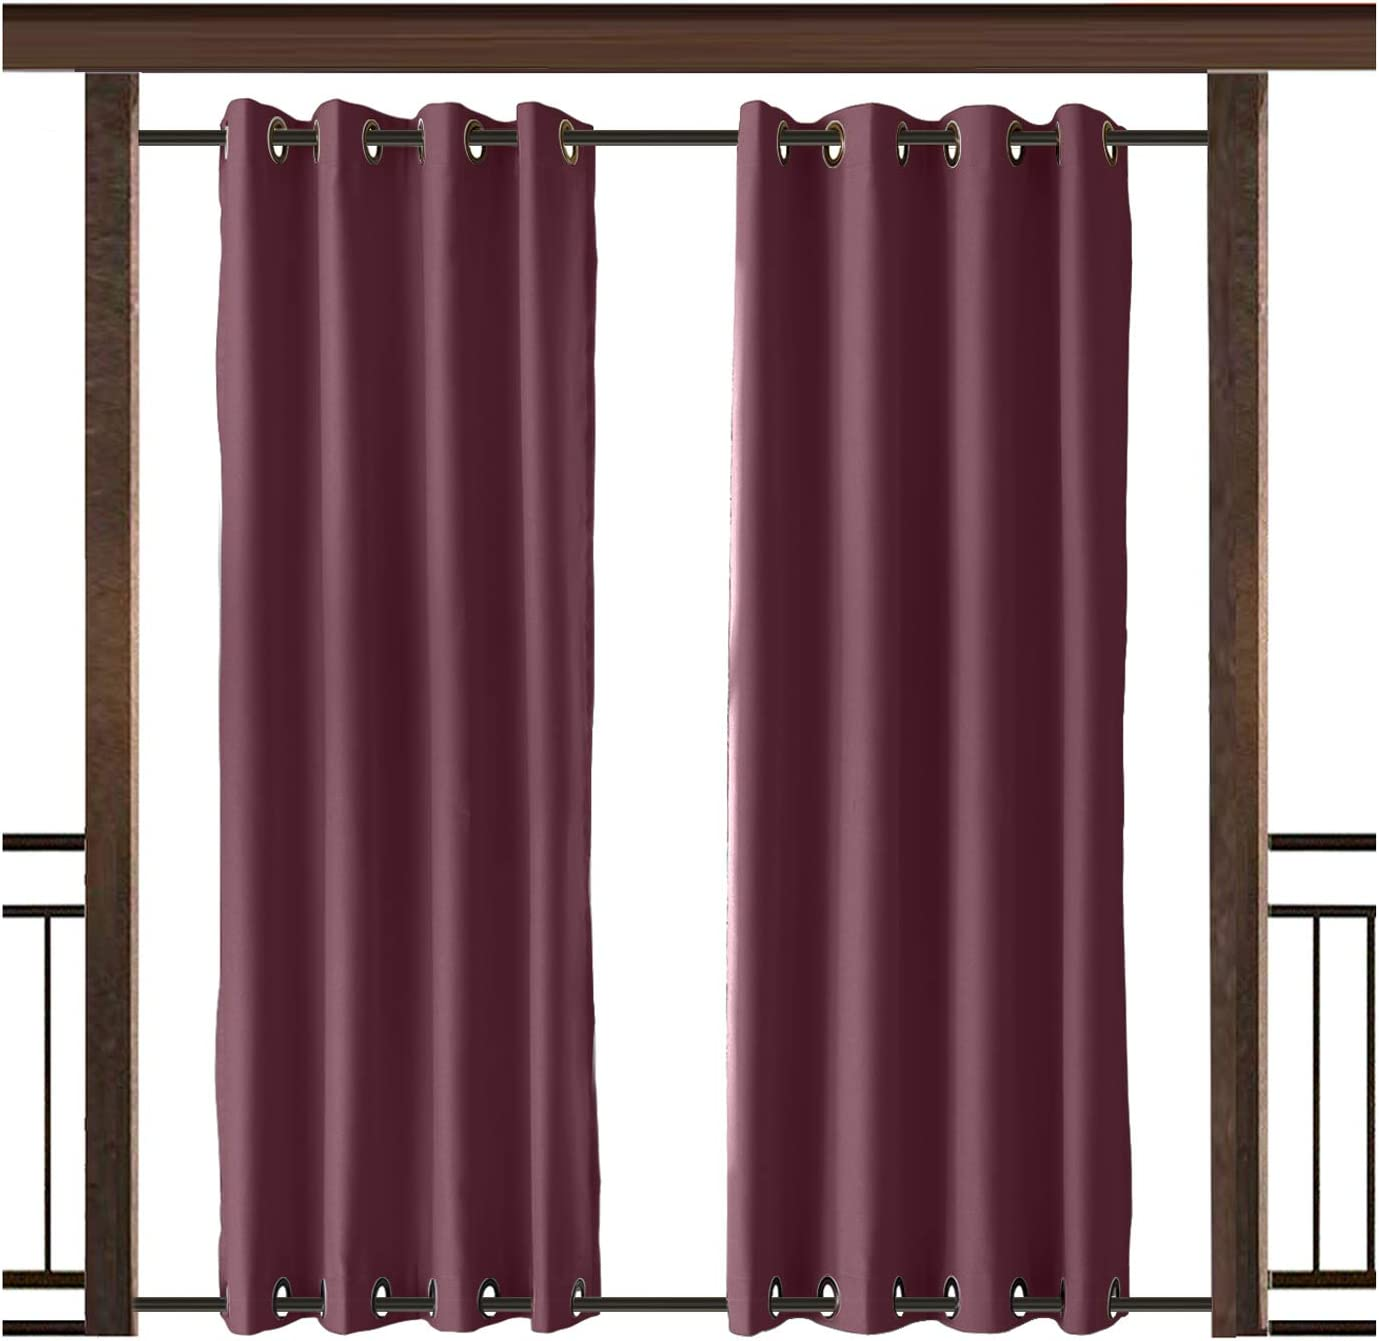 TWOPAGES Outdoor Curtain Rustproof Drape 店内限界値引き中 セルフラッピング無料 Waterproof 《週末限定タイムセール》 Both Grommet